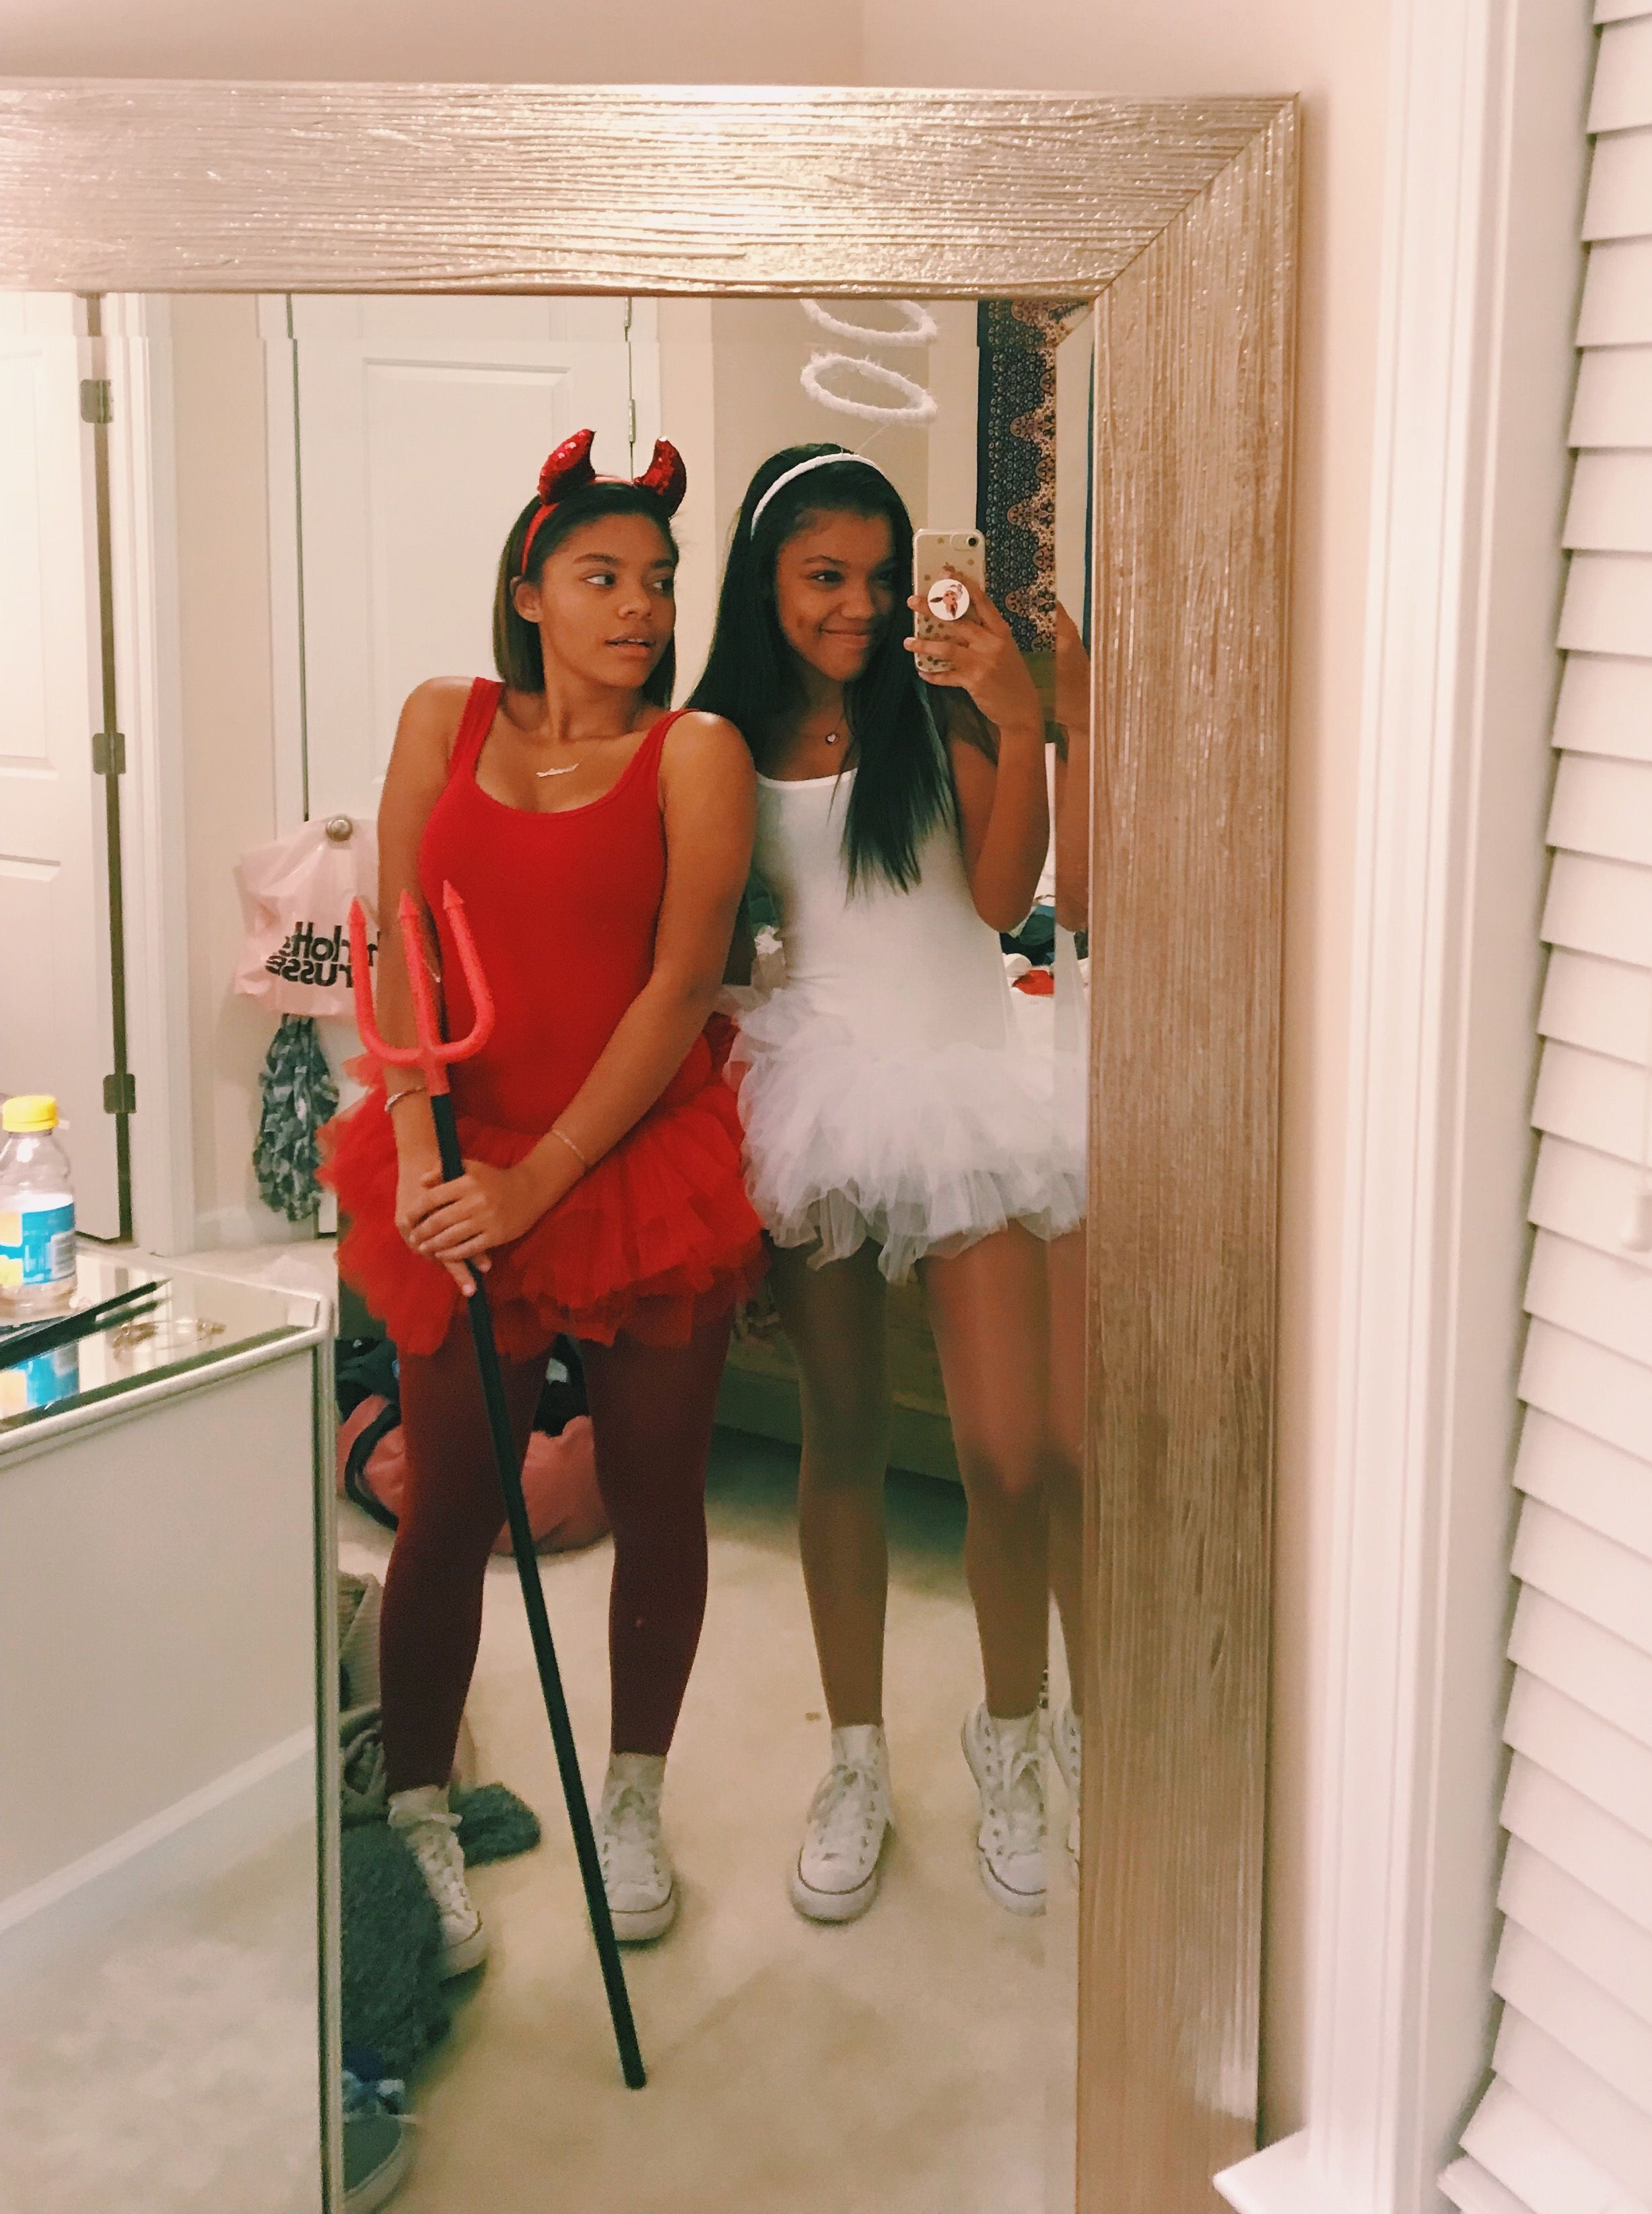 bff halloween costumes #halloweencostumes #halloween #halloweenparty #halloweenc…